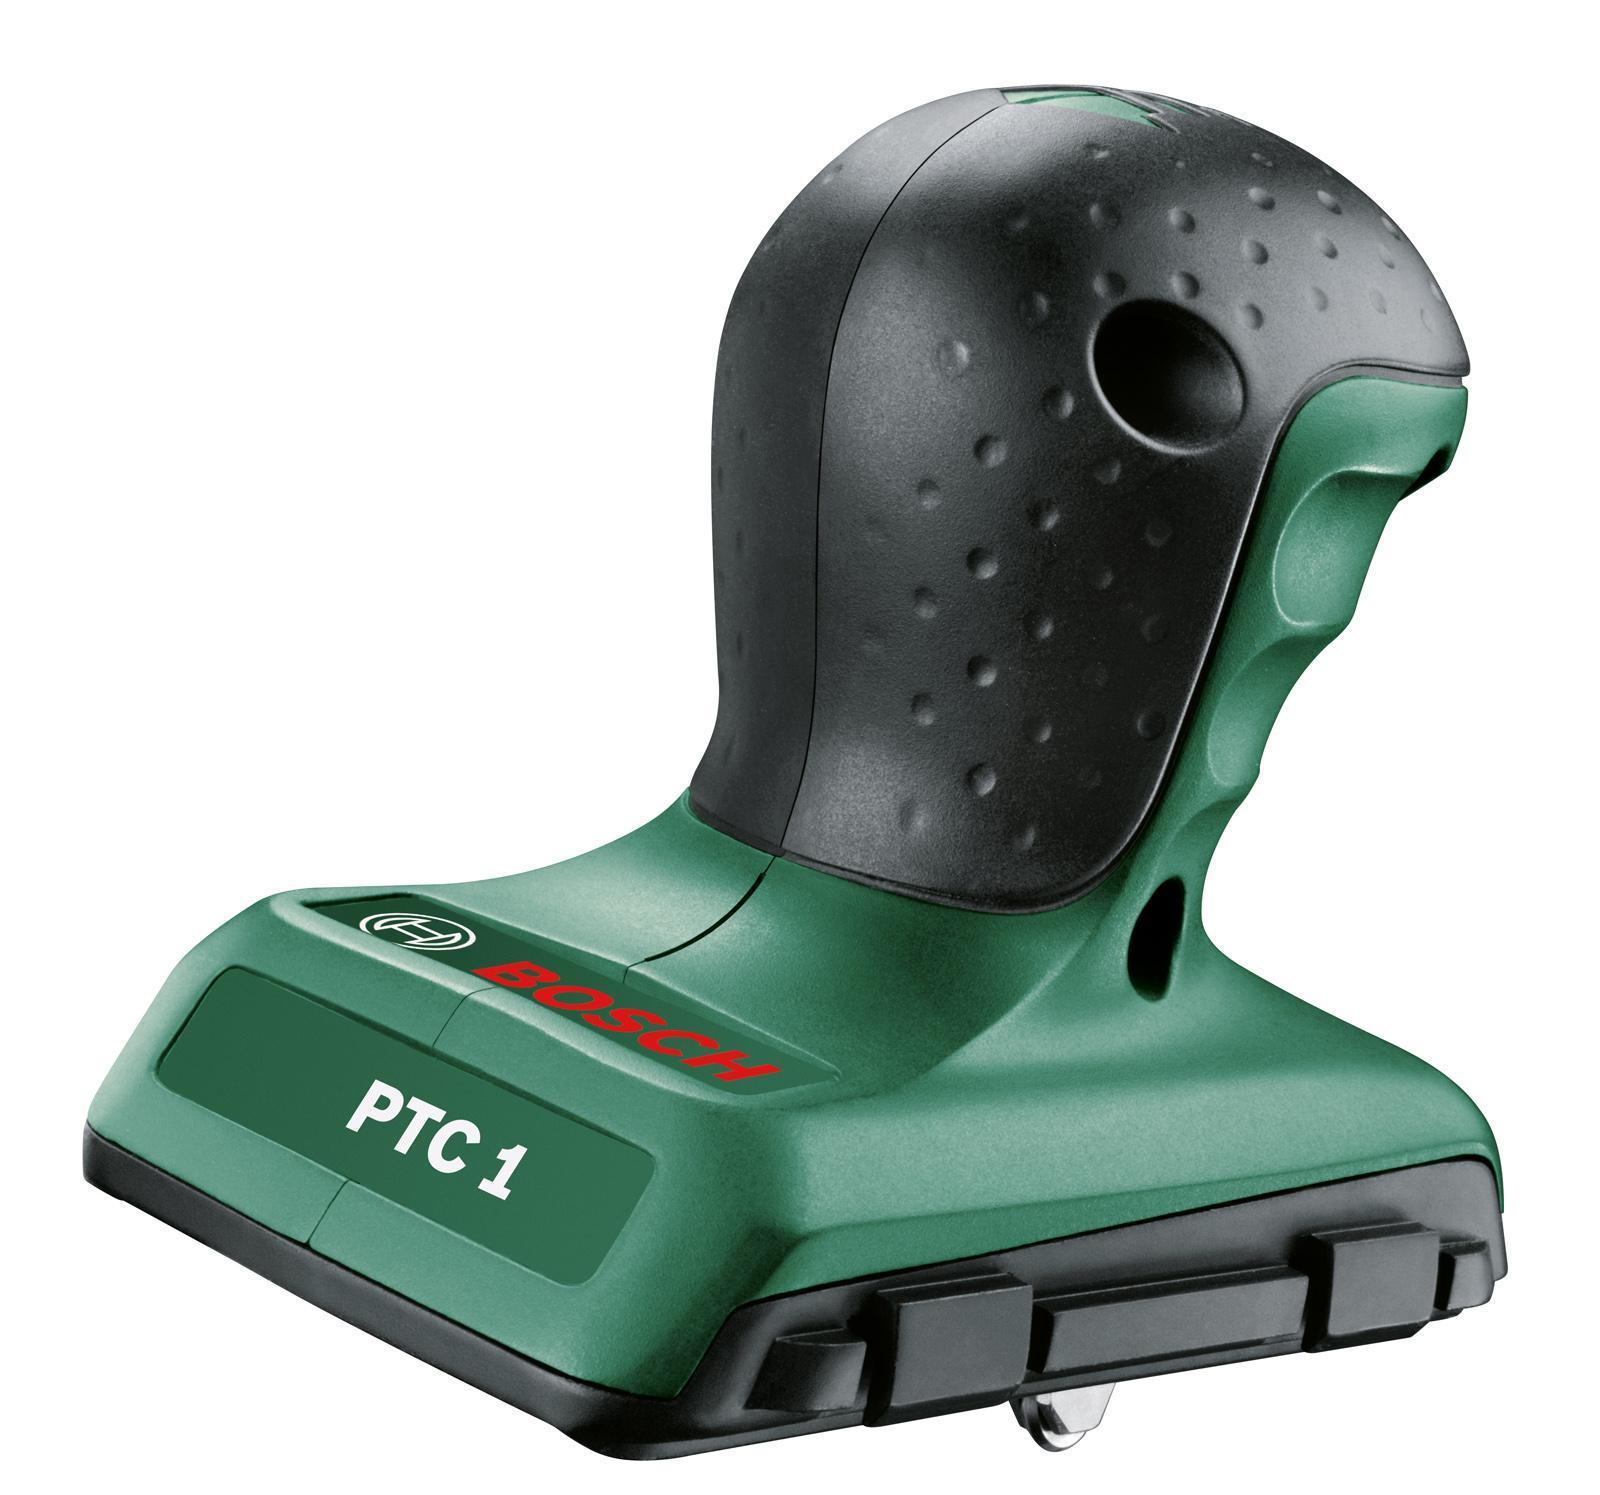 Плиткорез Bosch PTC 1, 300 мм